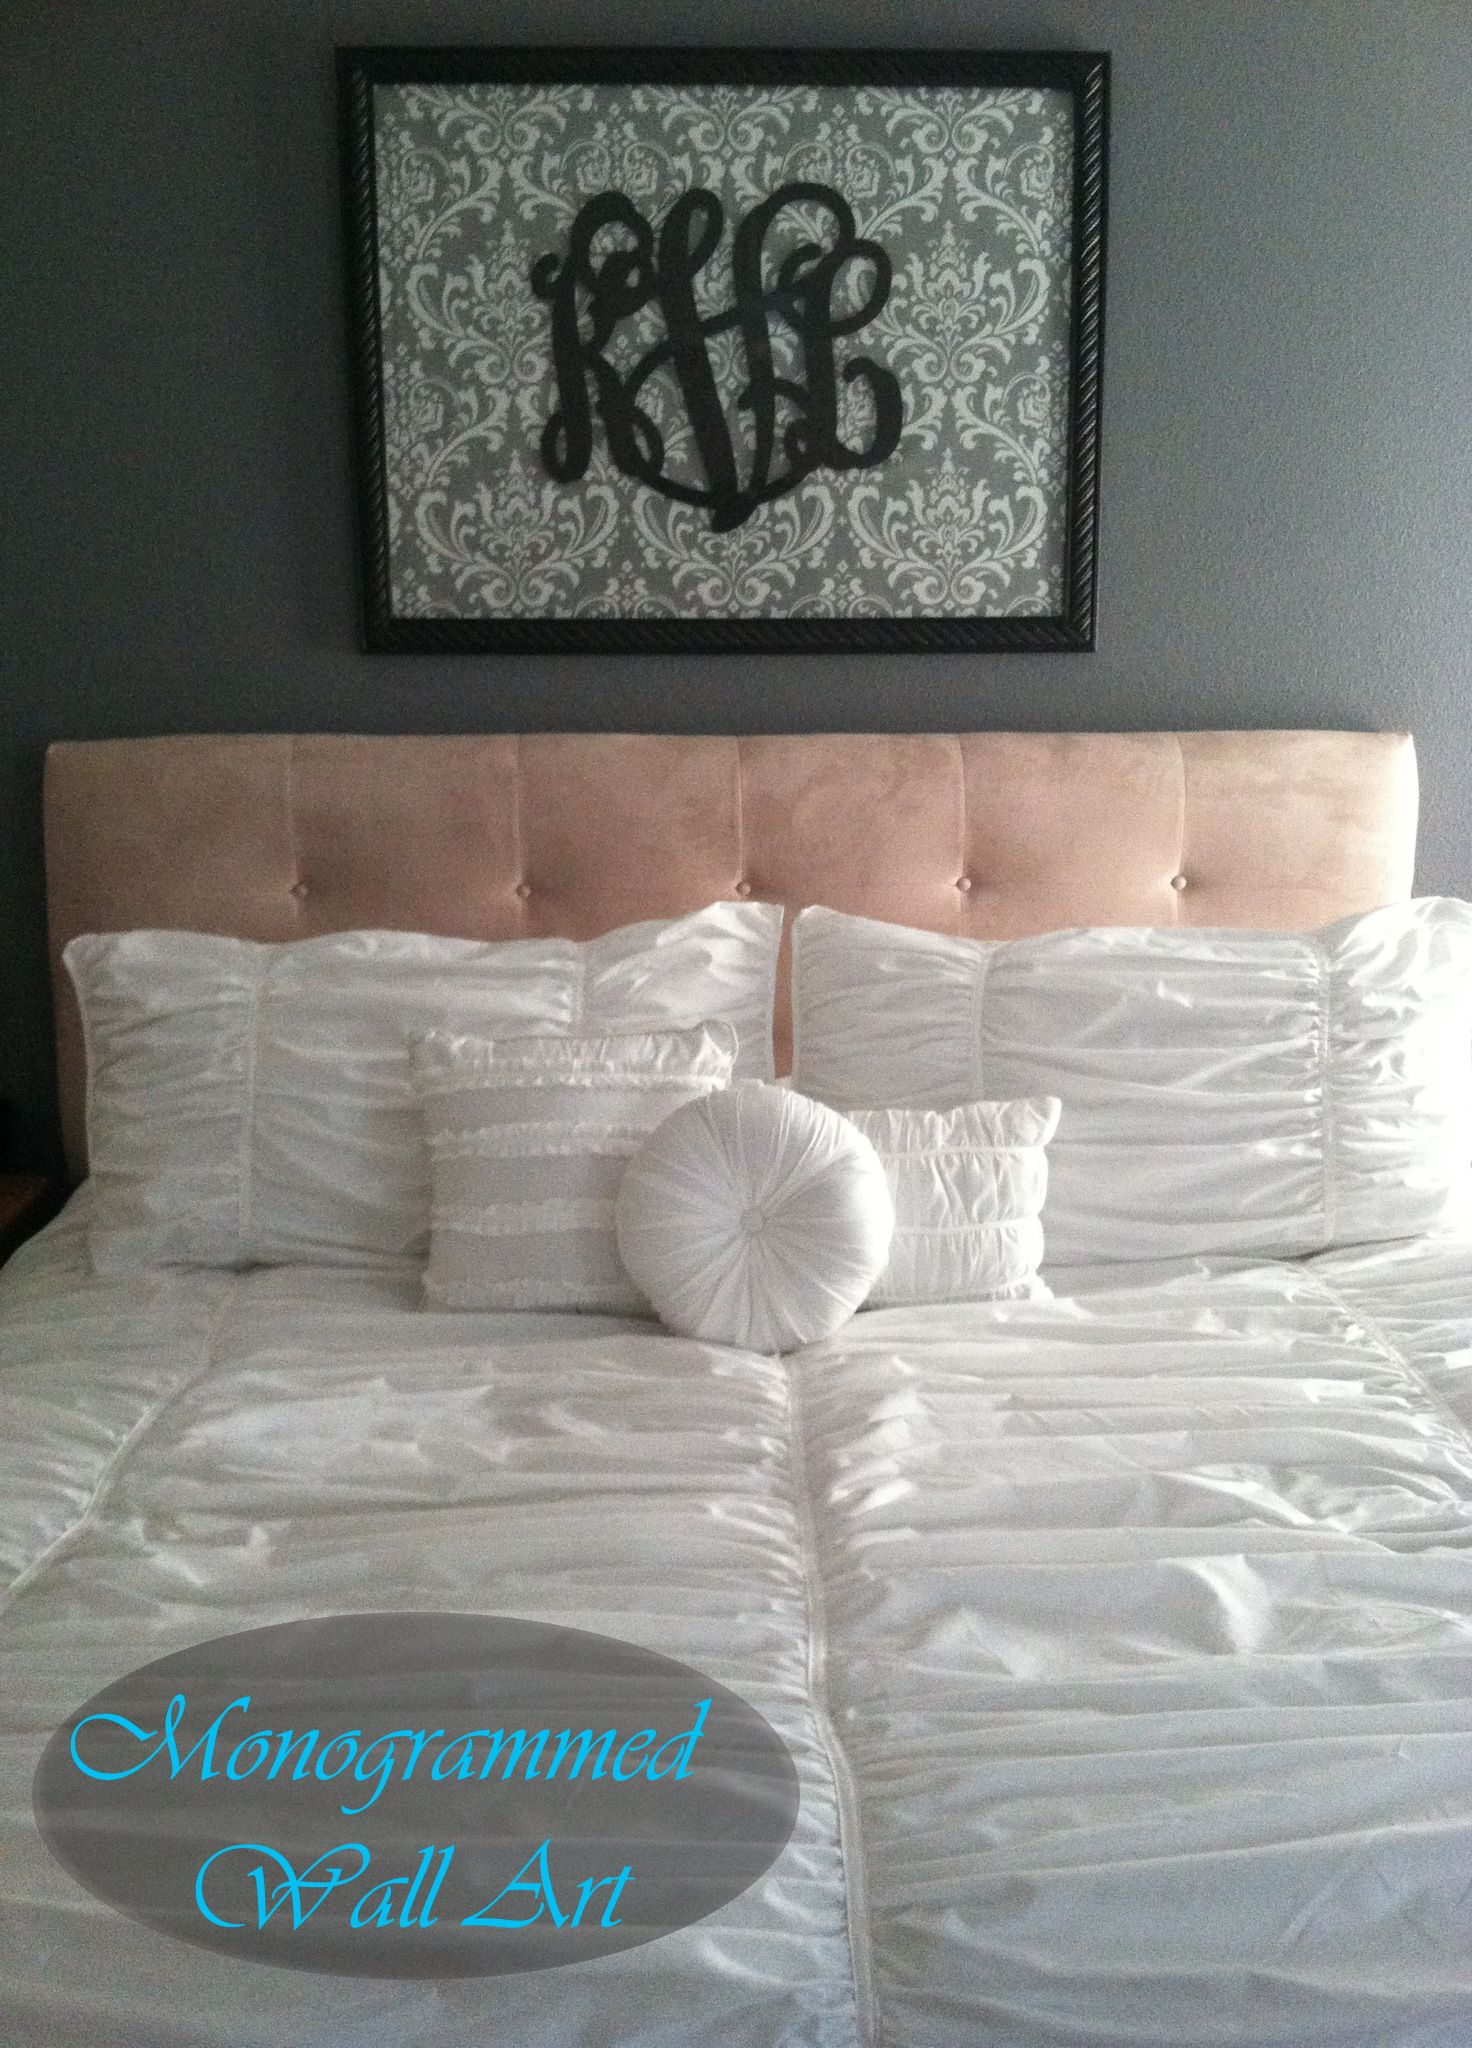 Master bedroom wall decor diy  Monogrammed wall art over bed diy monogrammed letters bedroom